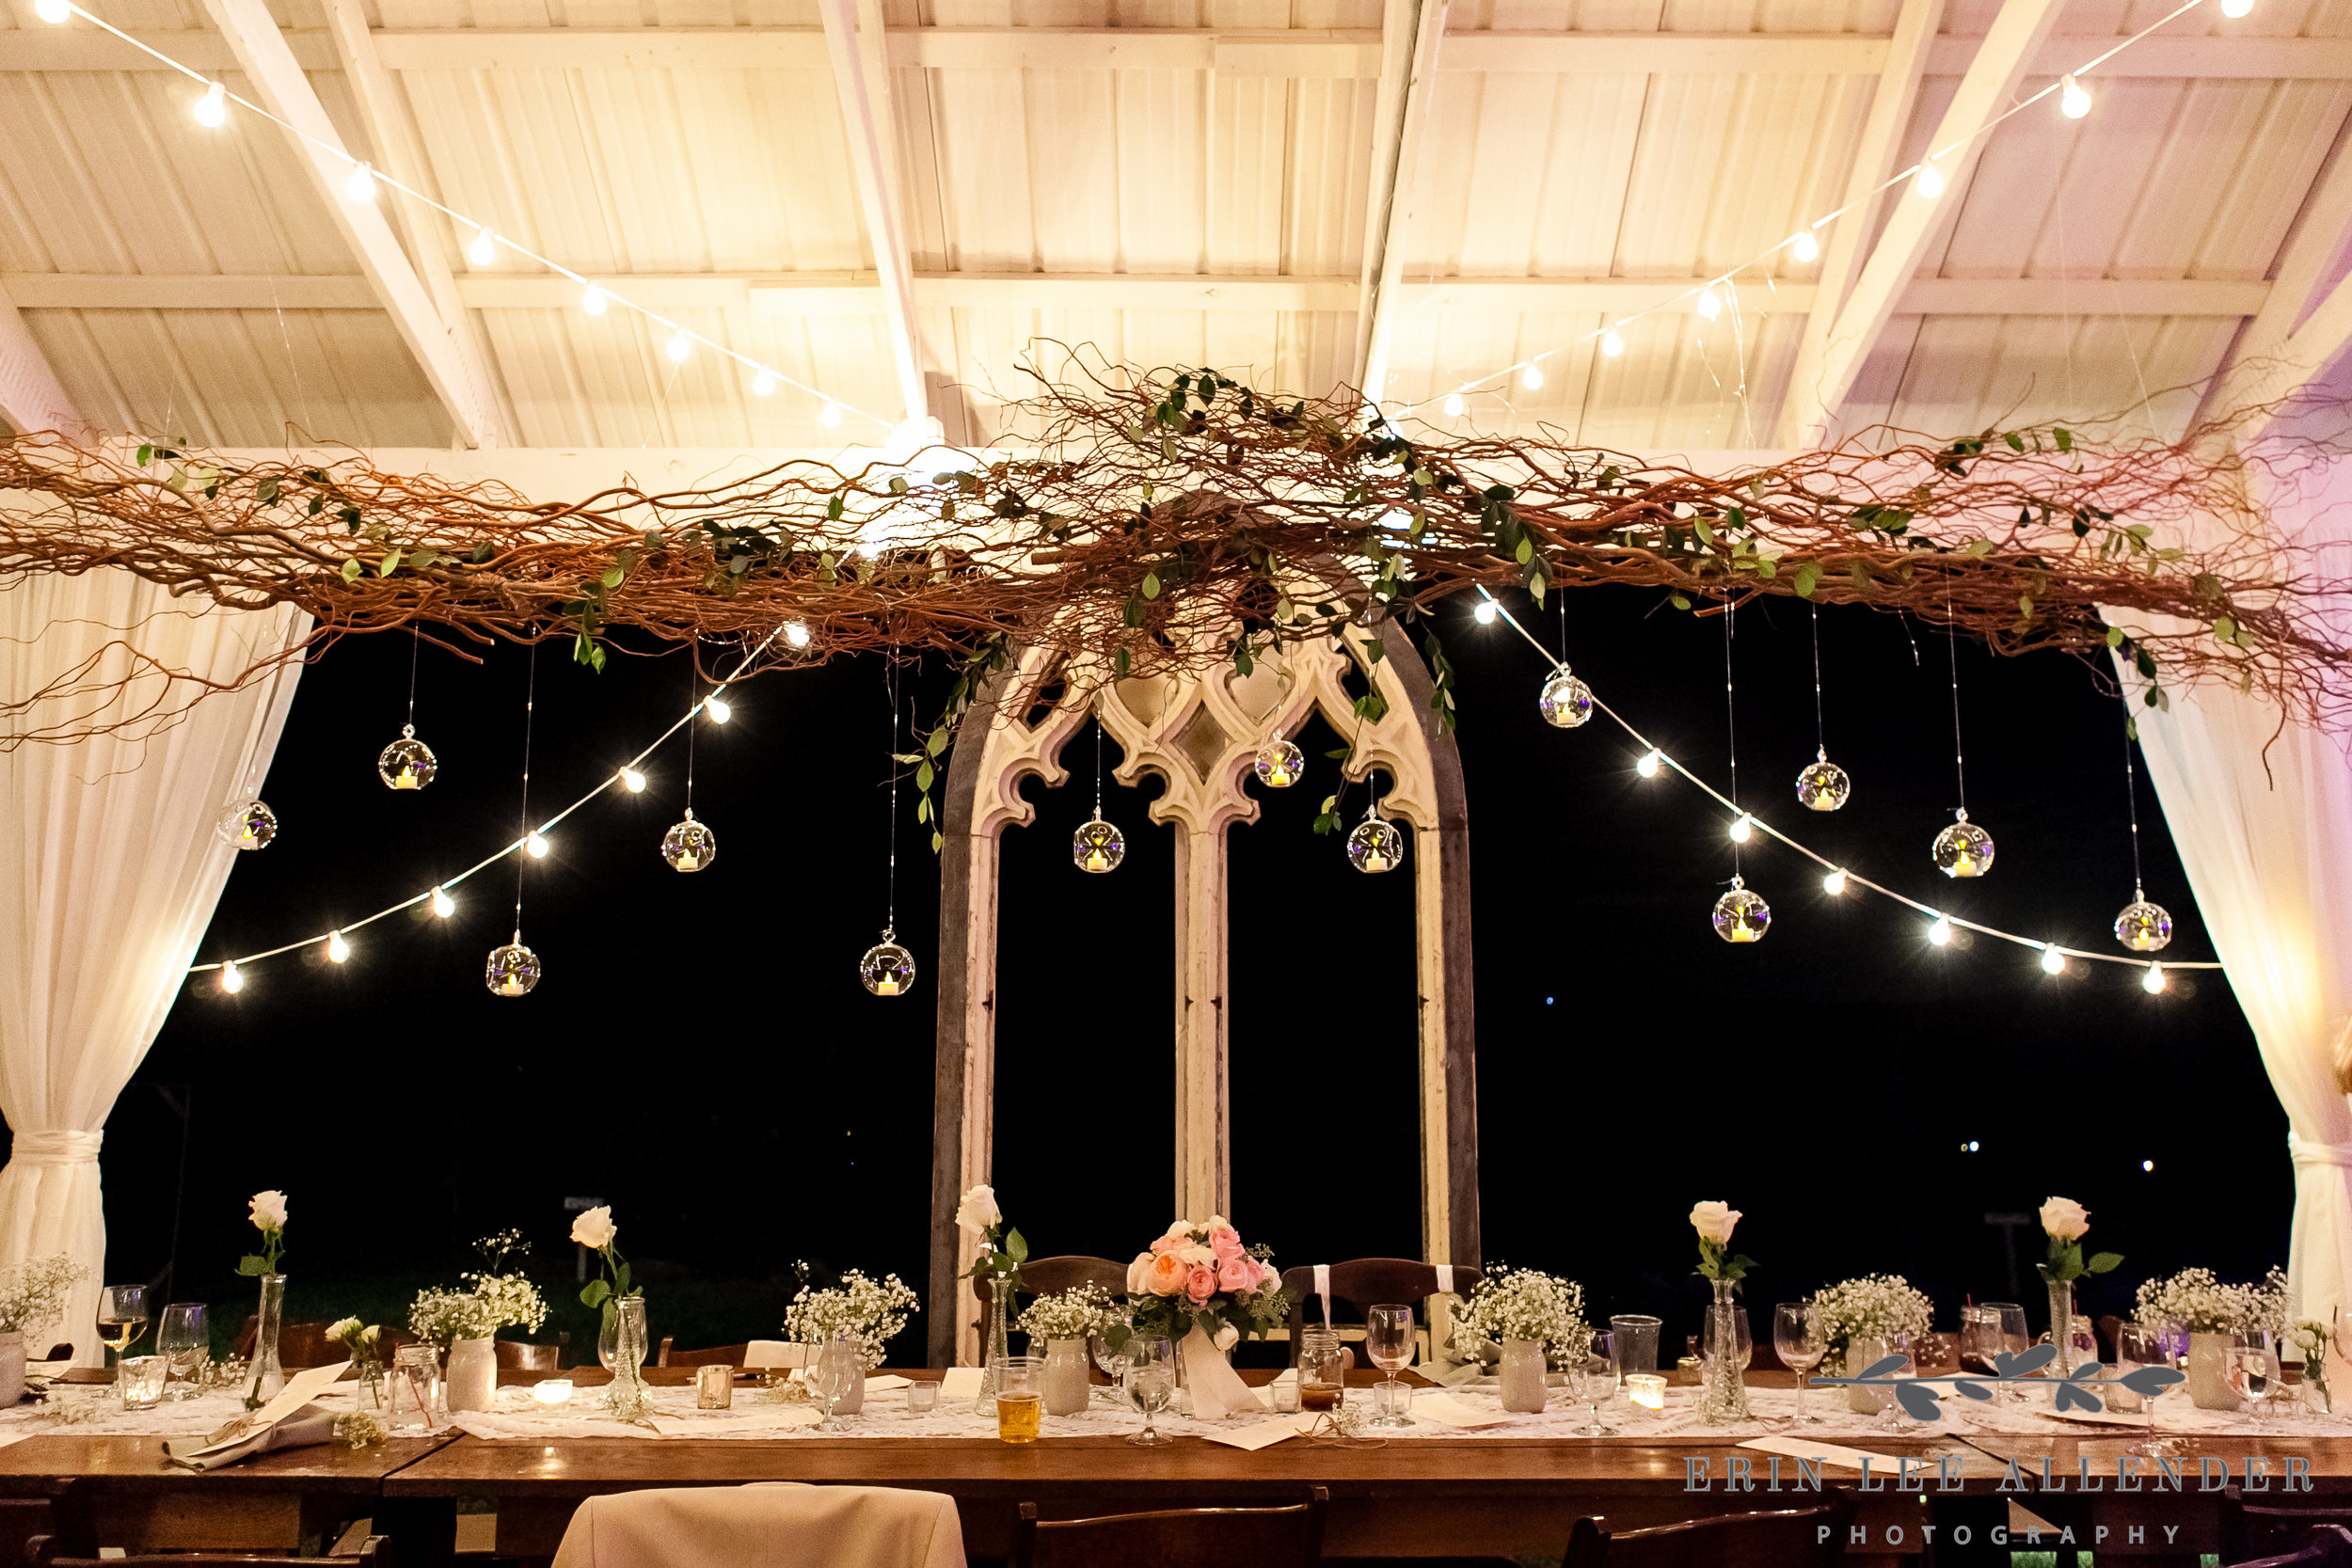 Church_Window_Head_Table_Backdrop